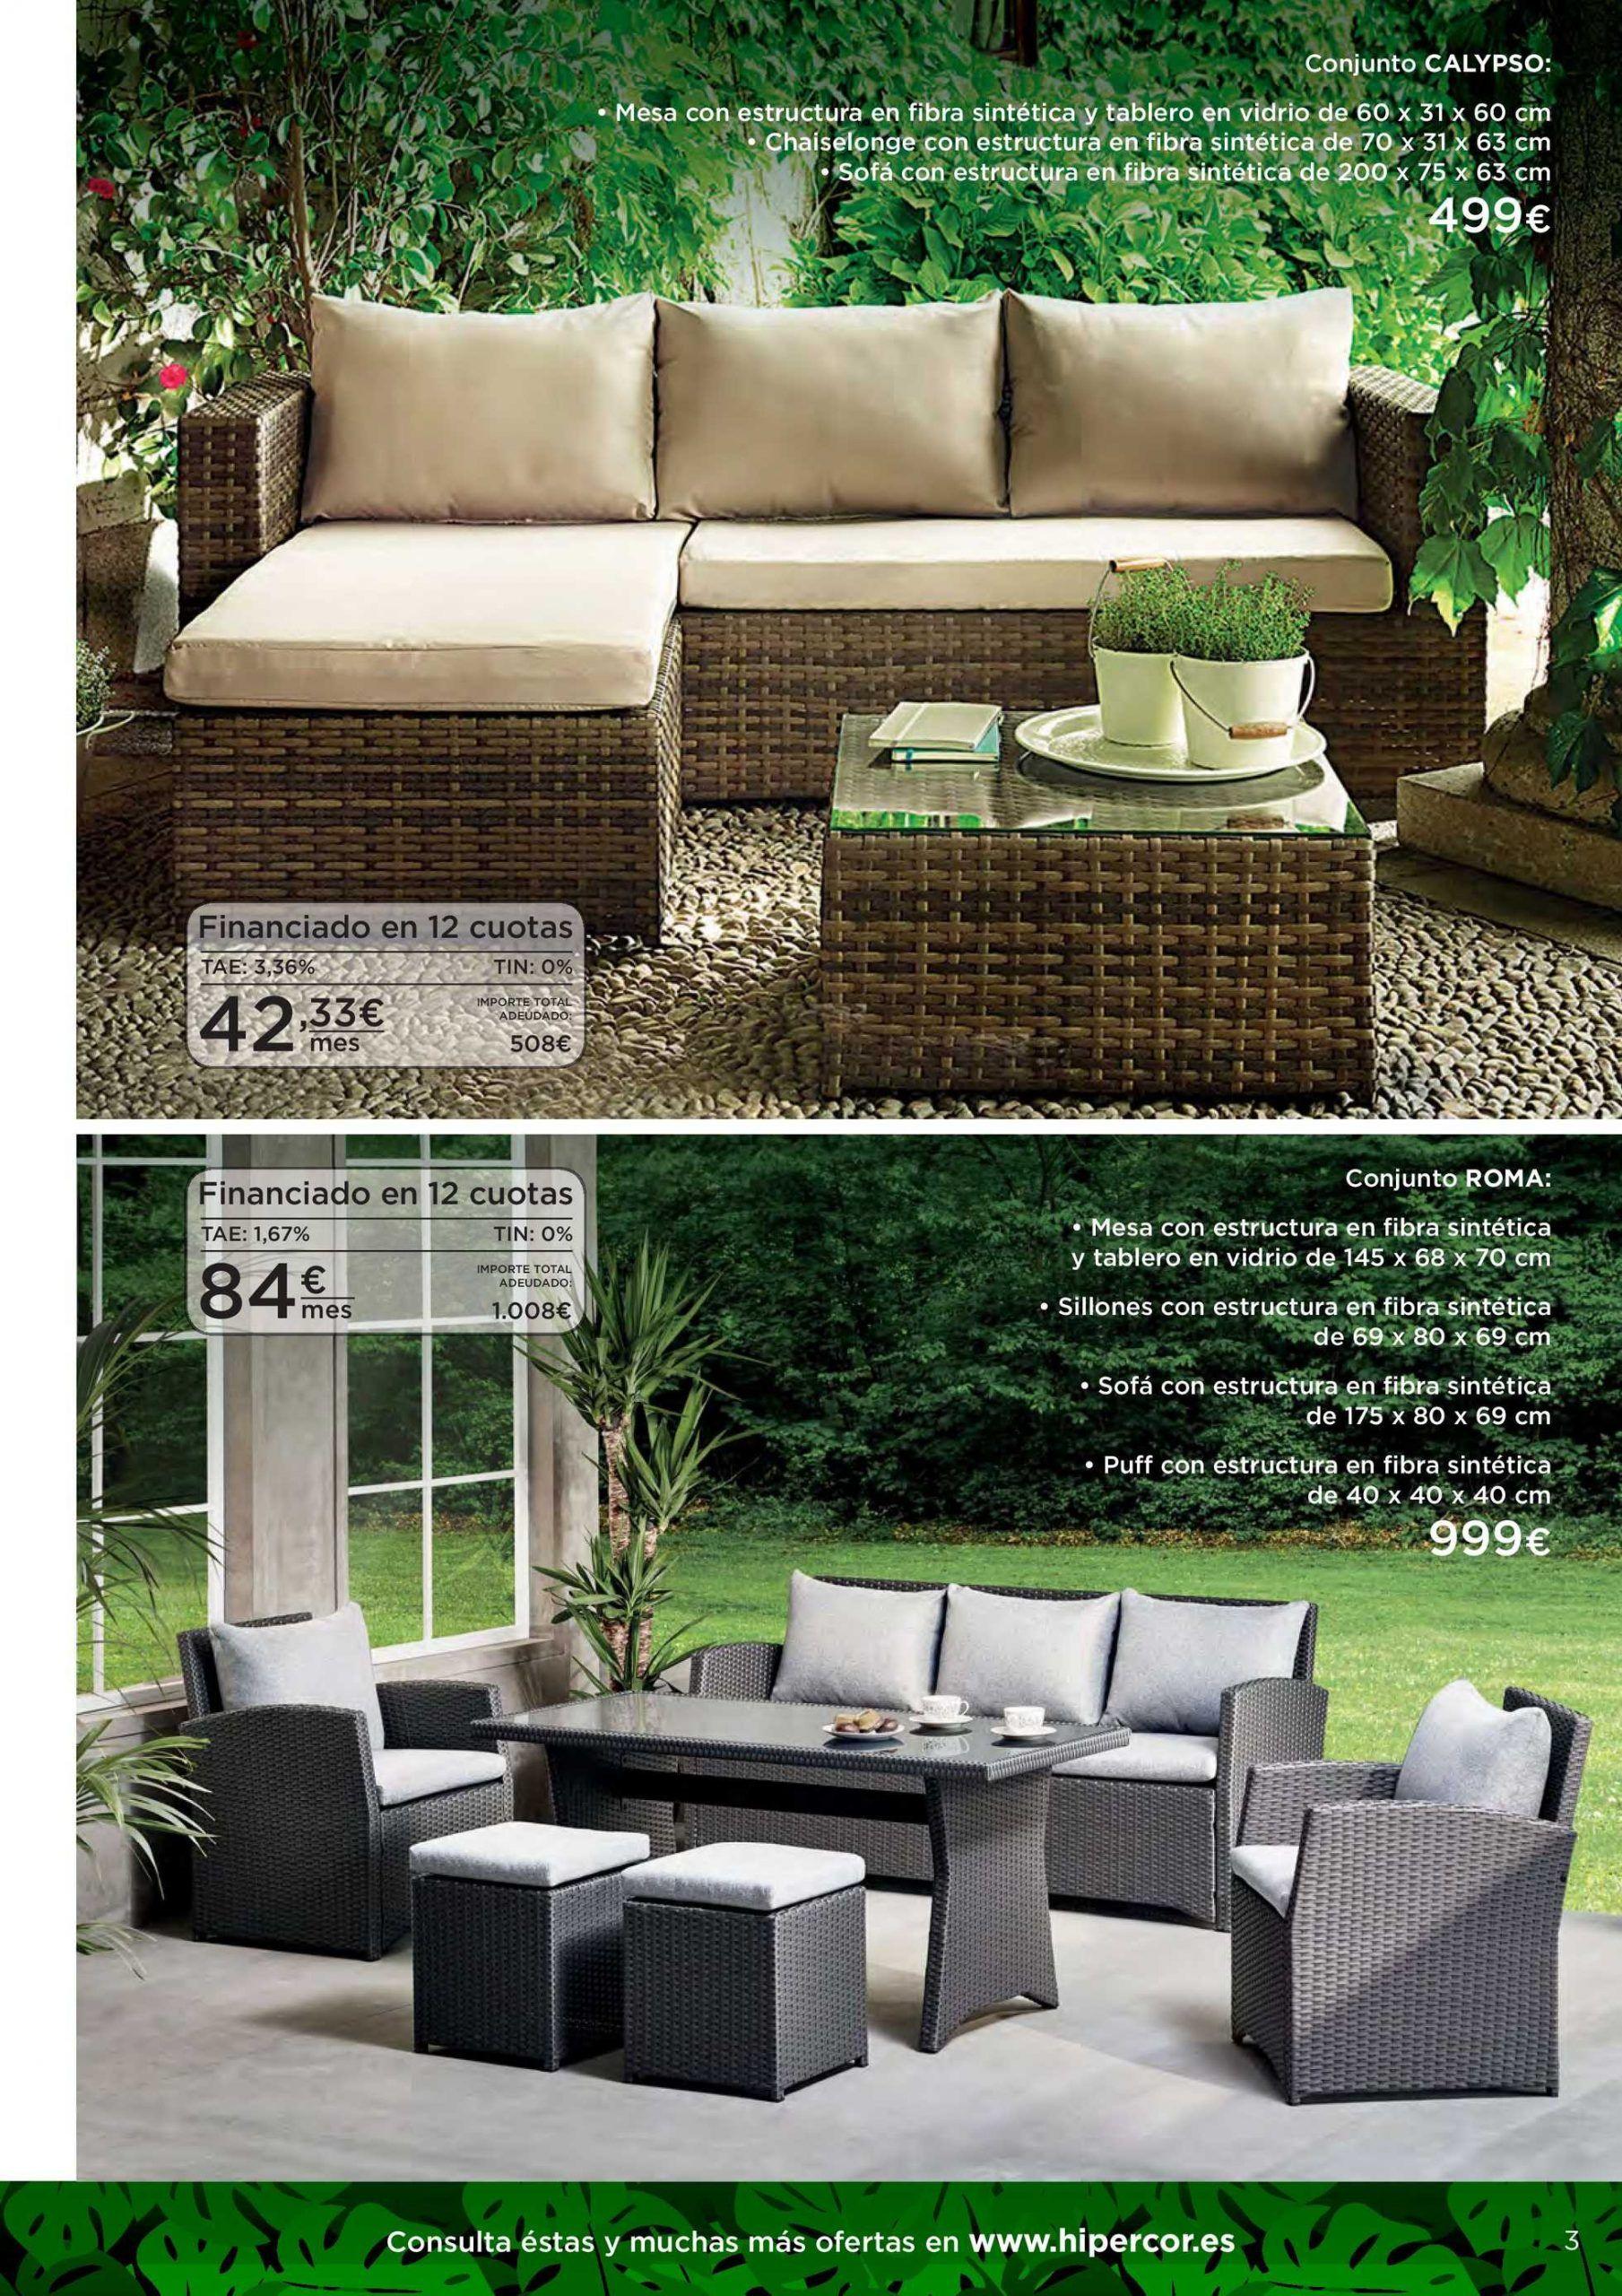 Muebles De Jardin Hipercor 2017 2020